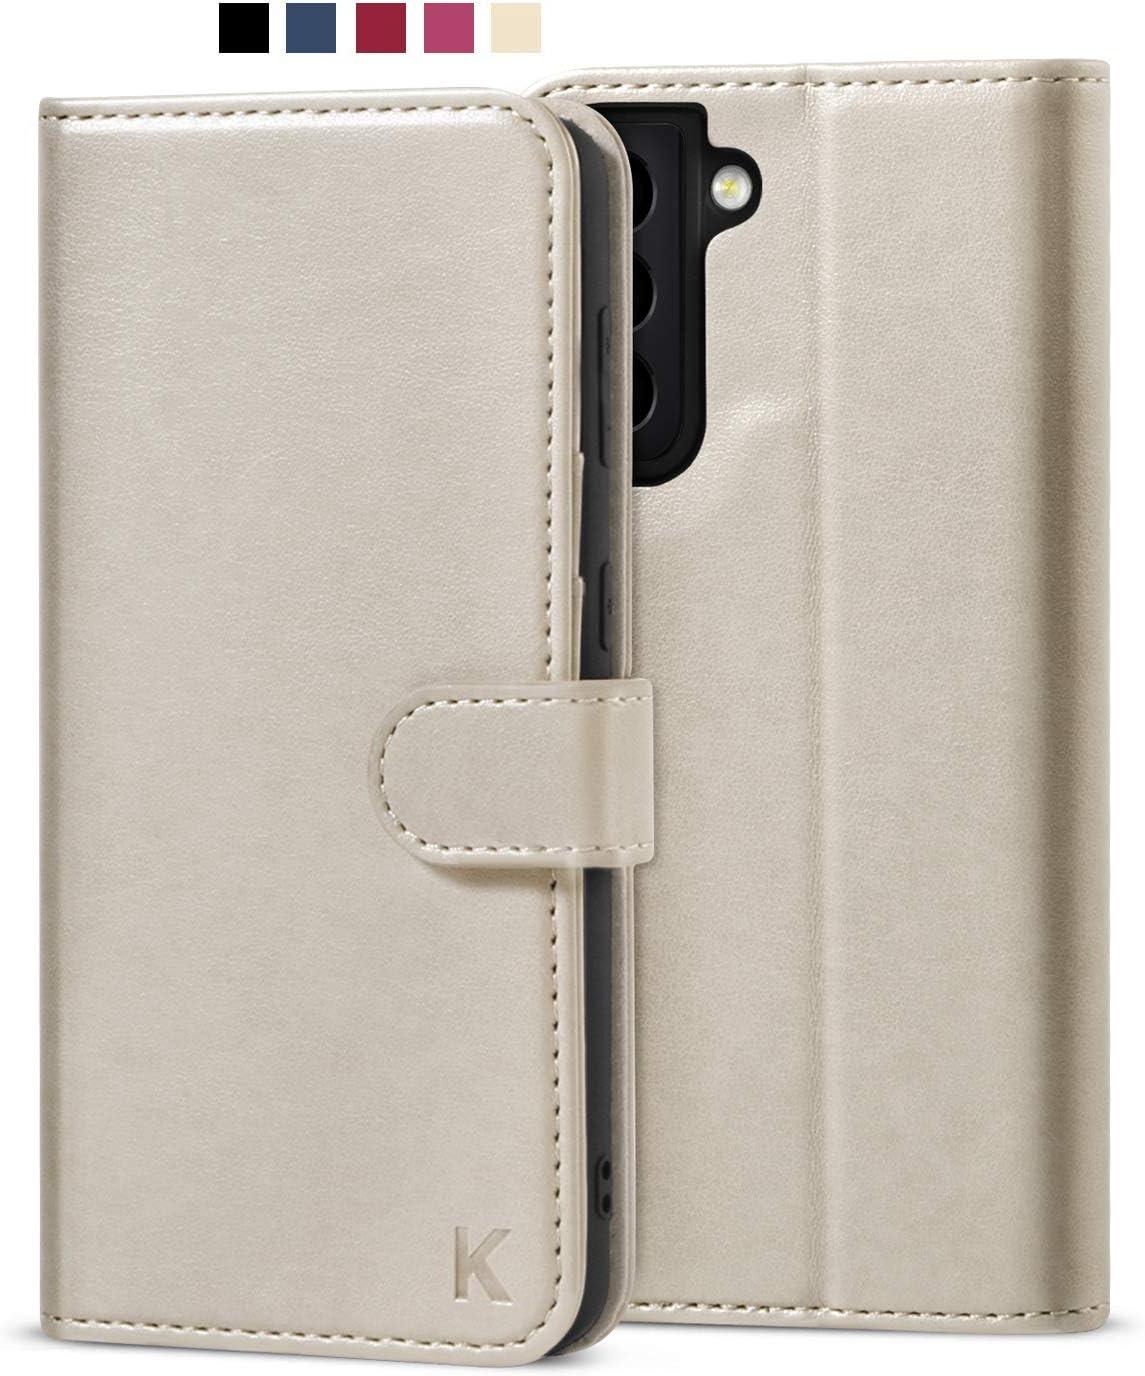 KILINO Galaxy S21 Wallet Case [RFID Blocking] [PU Leather] [Shock-Absorbent Bumper] [Soft TPU] [Card Slots] [Kickstand] Flip Folio Cover for Samsung Galaxy S21 5G (Gray)